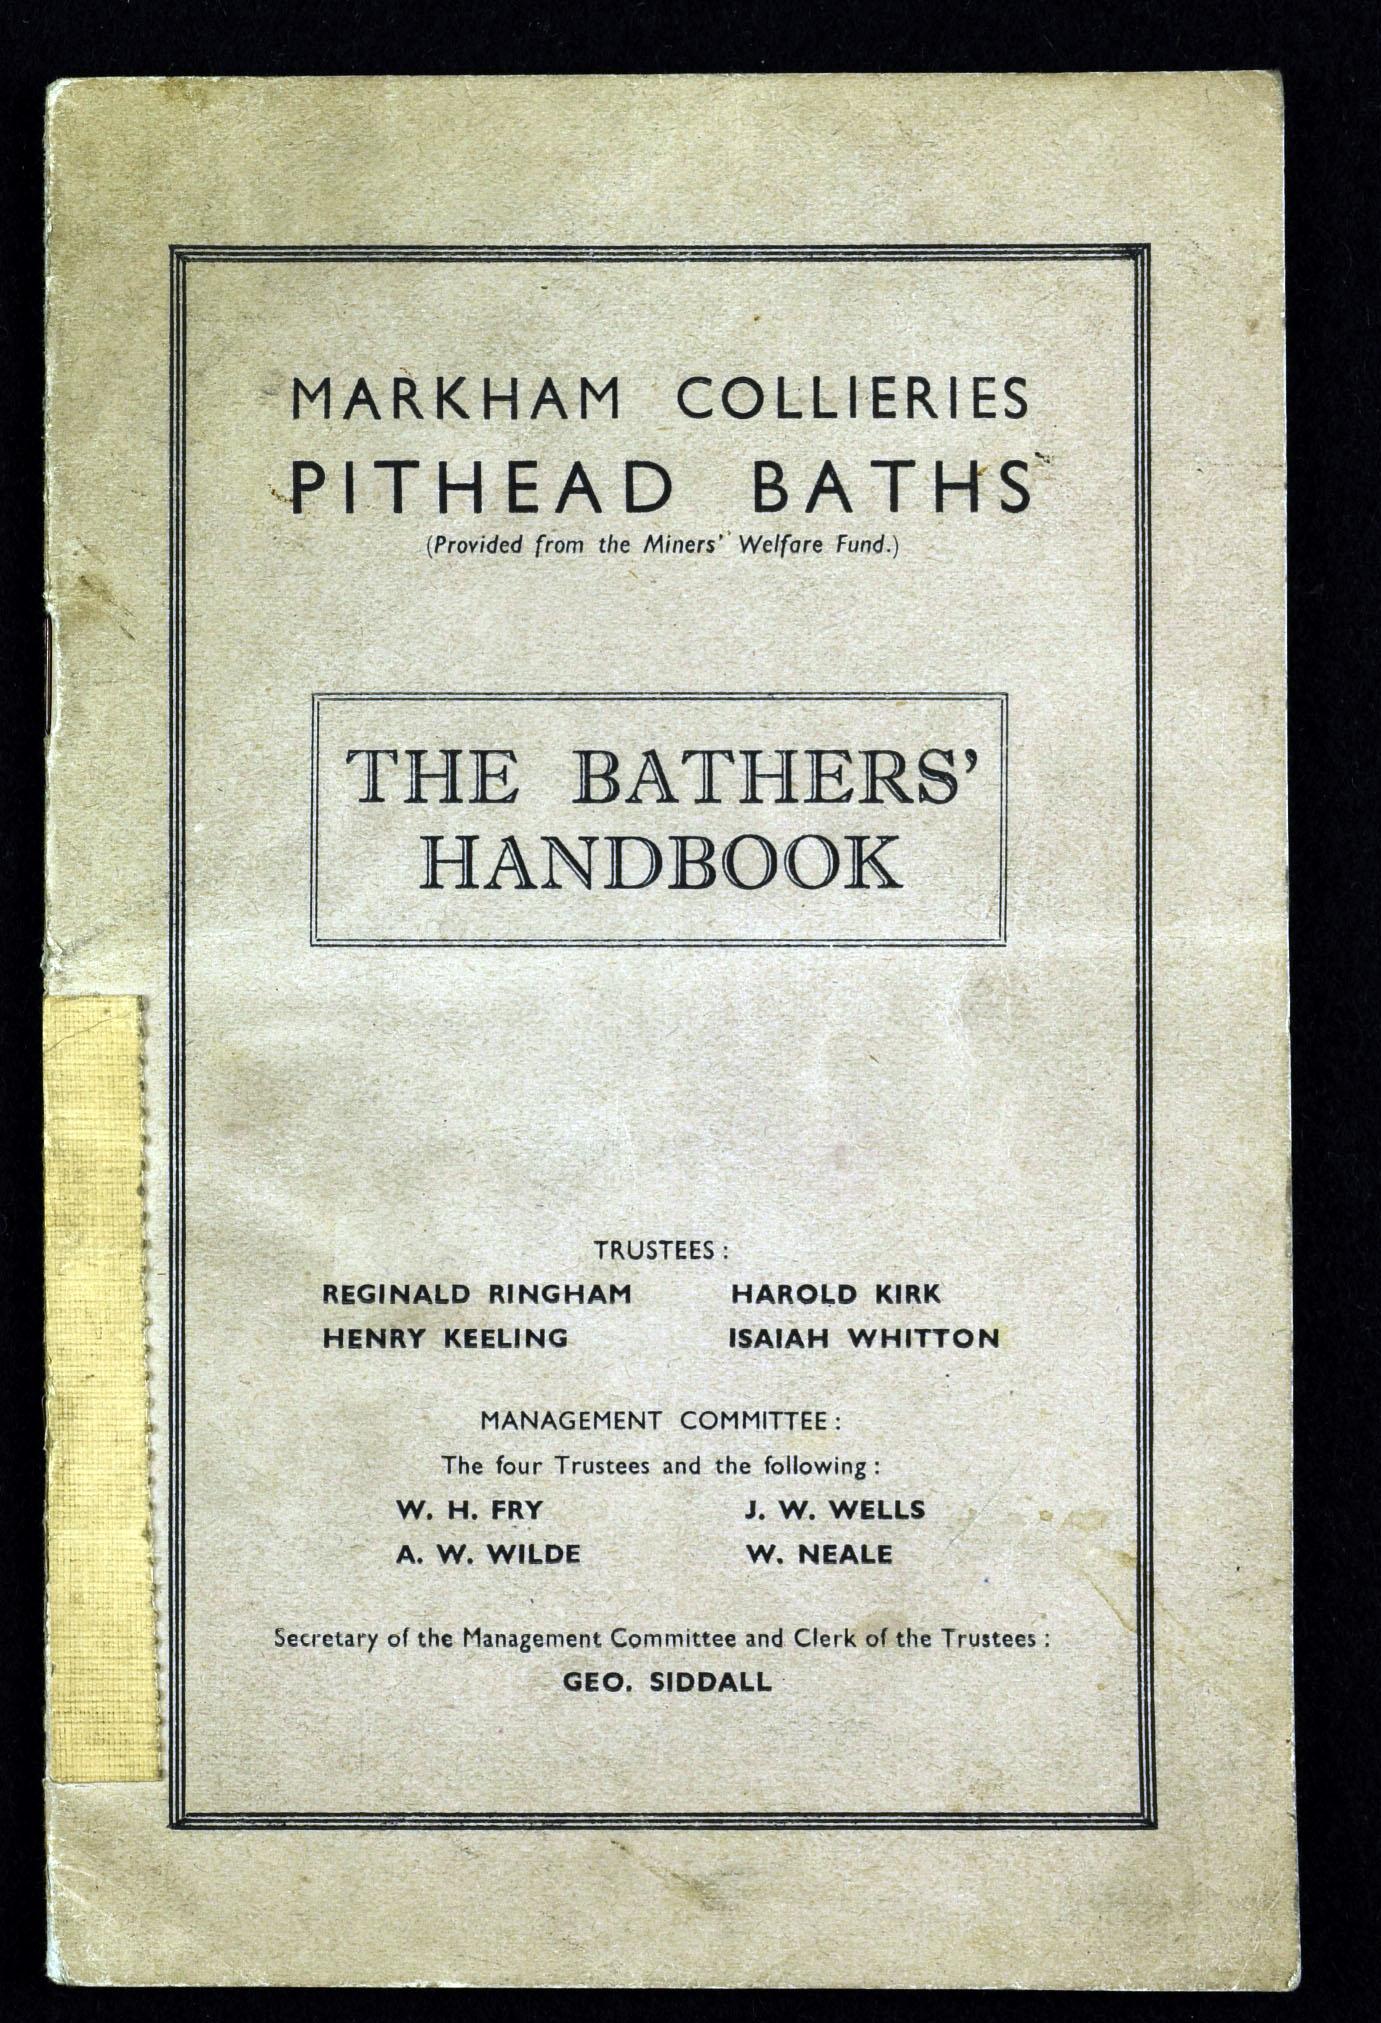 a476_7-the-bathers-handbook-markham-colliery-1935x1939